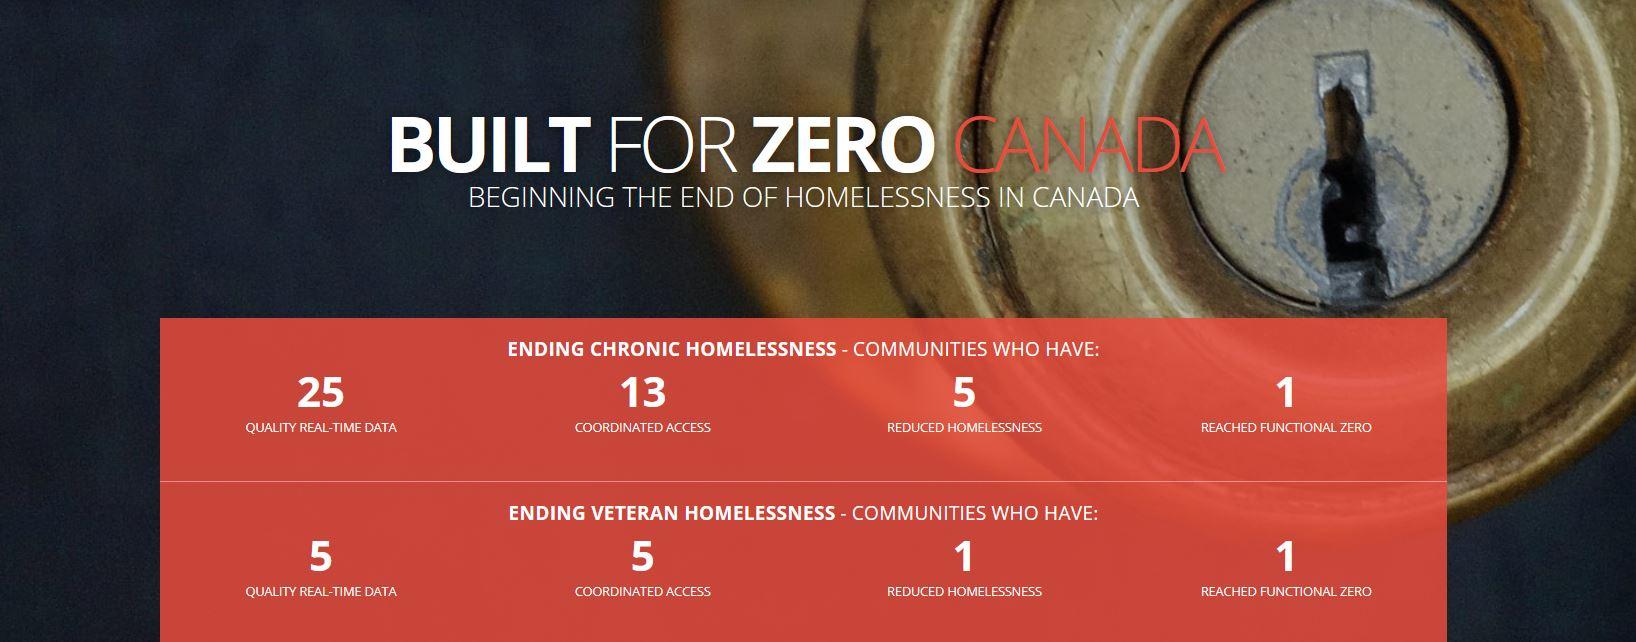 Built for Zero Canada Dashboard image